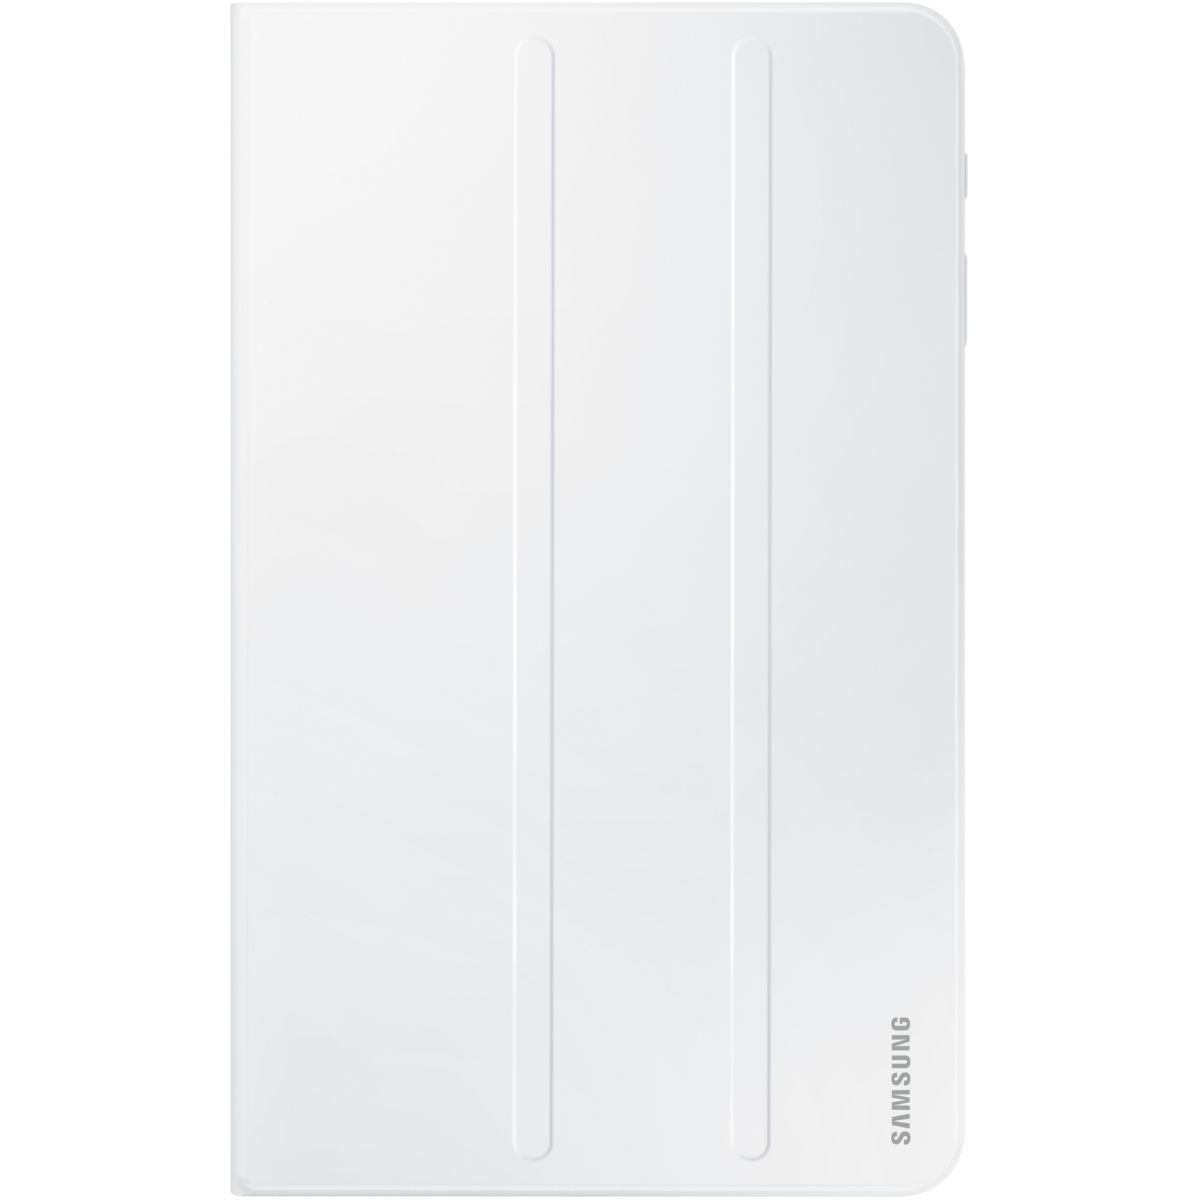 Etui tablette samsung book cover tab a 6 10'' blanc (photo)